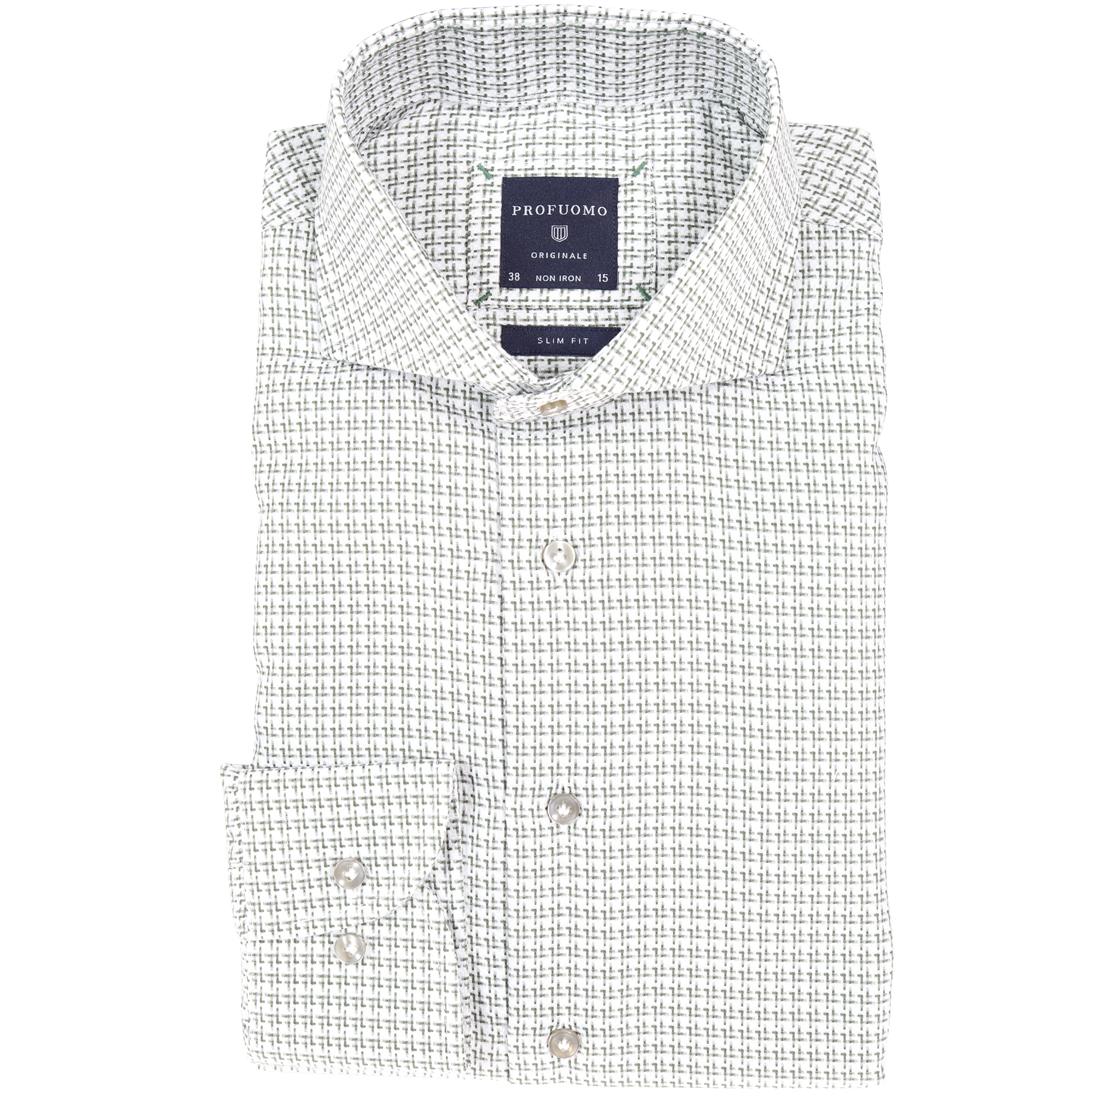 Profuomo overhemd Slim Fit ppph3a1012 in het Groen